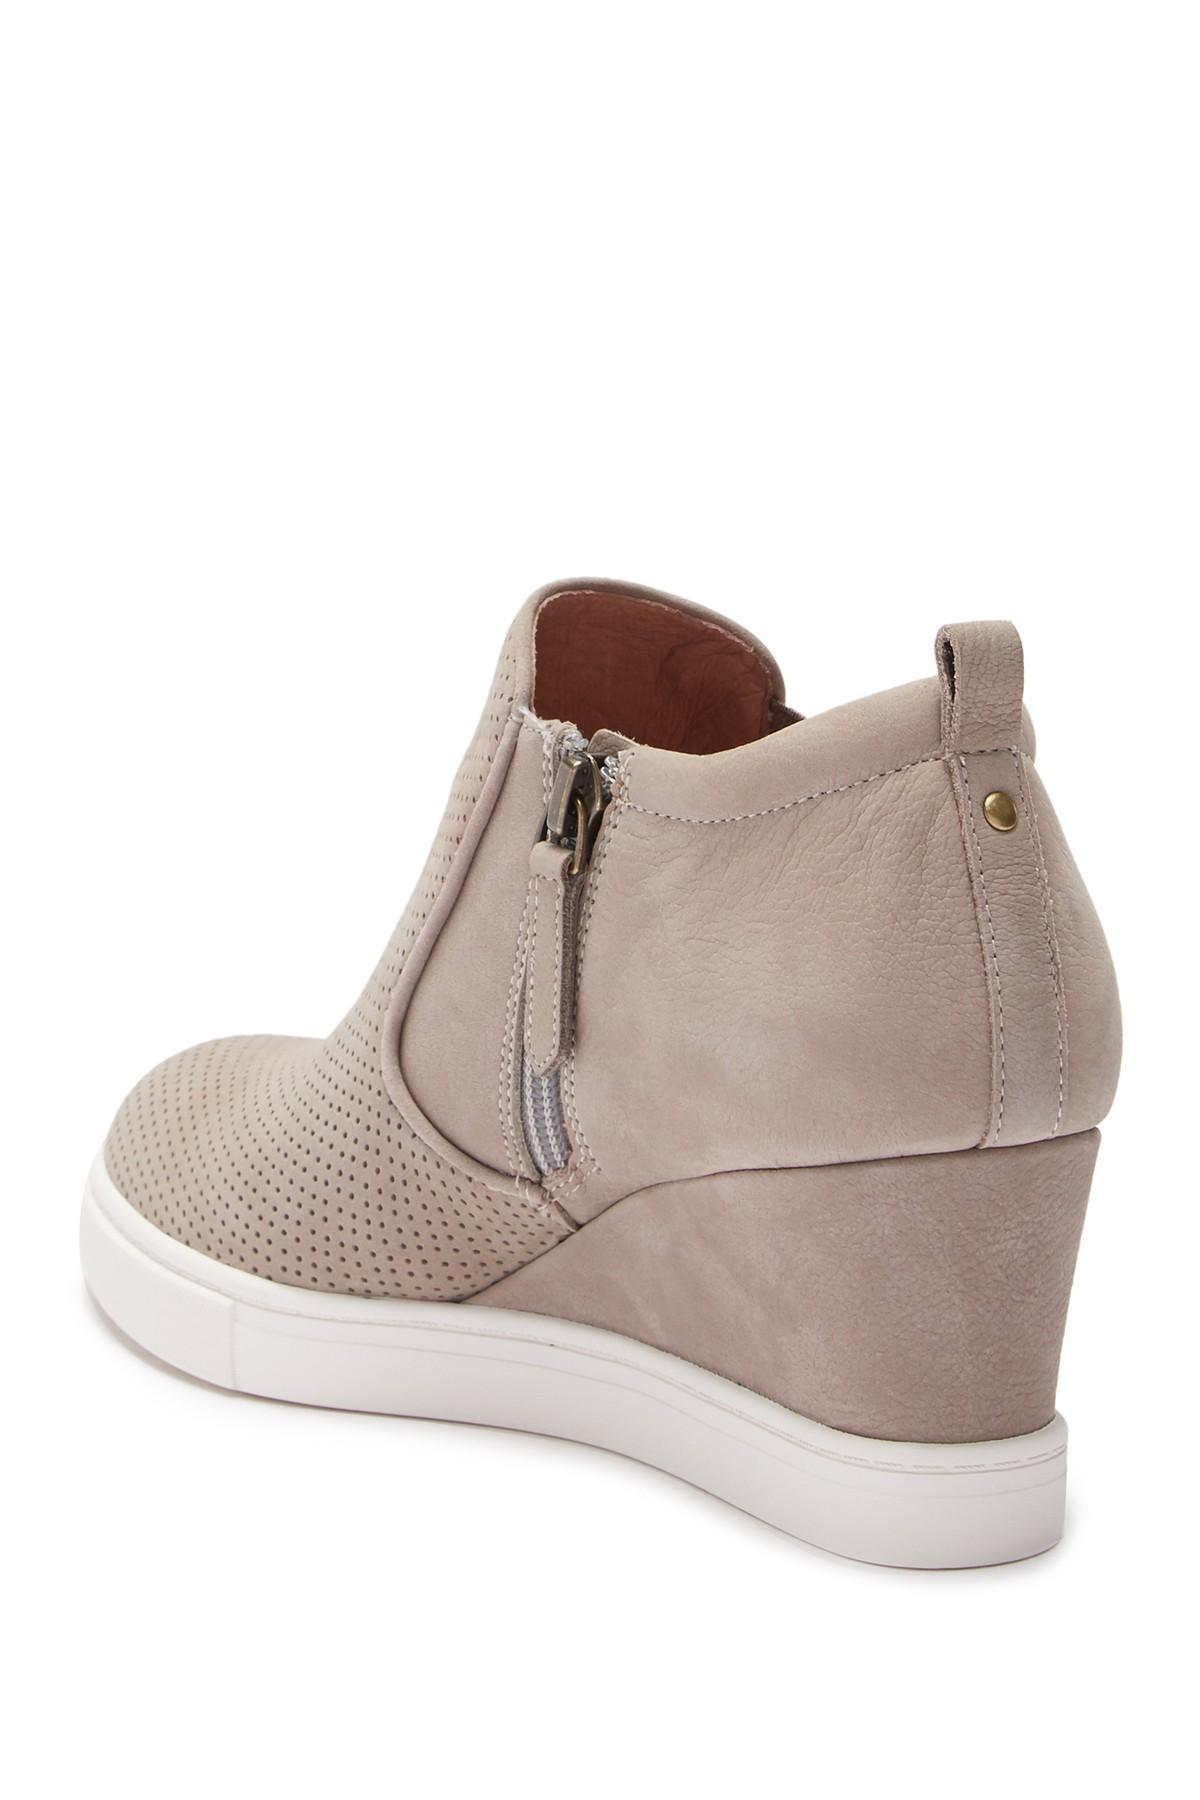 Caslon Aiden Wedge Sneaker in Brown - Lyst